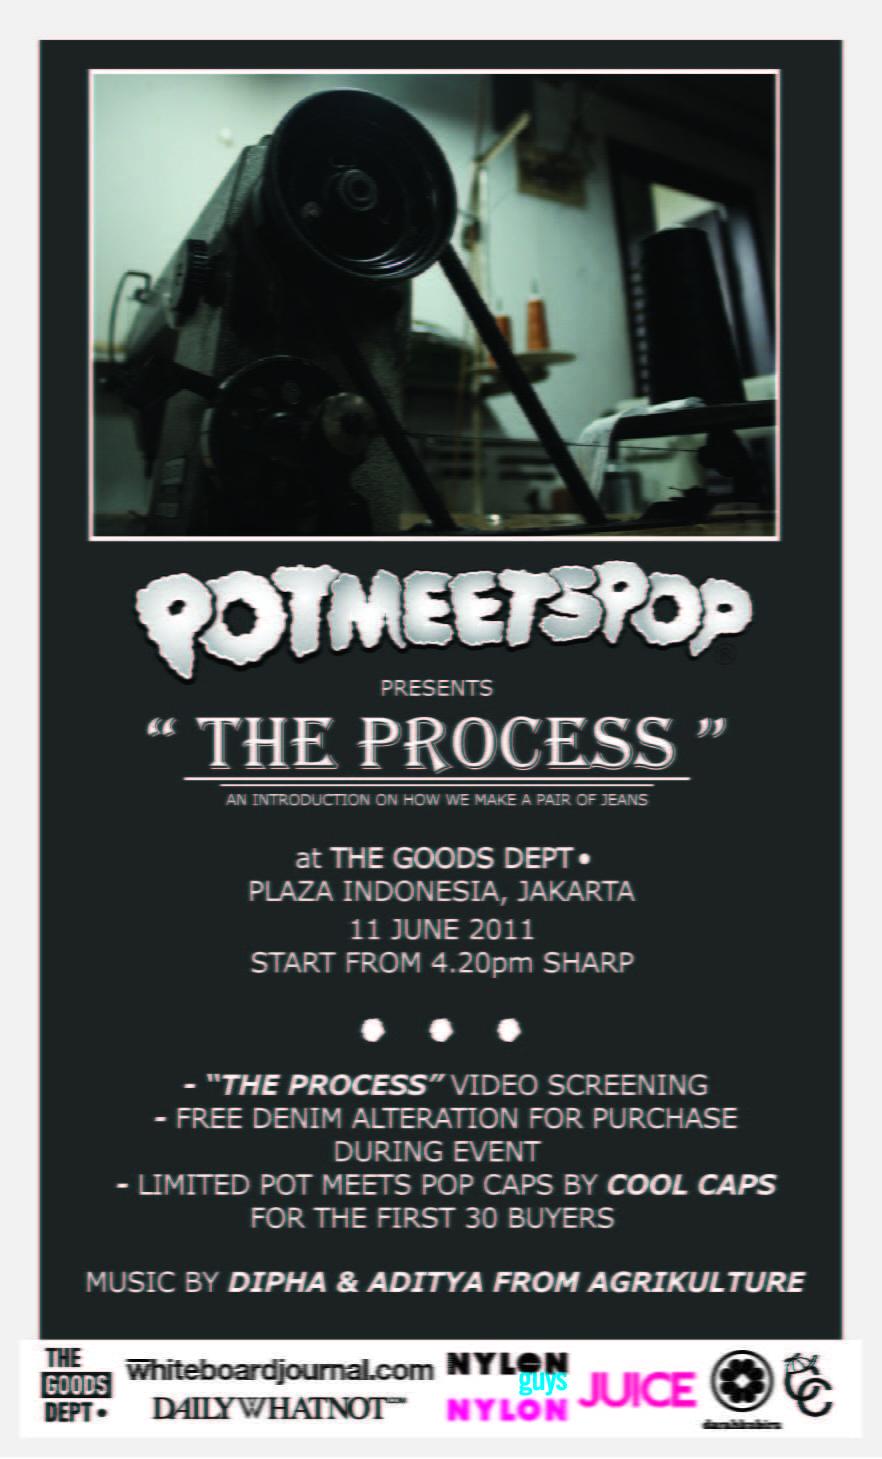 PMPtheprocess